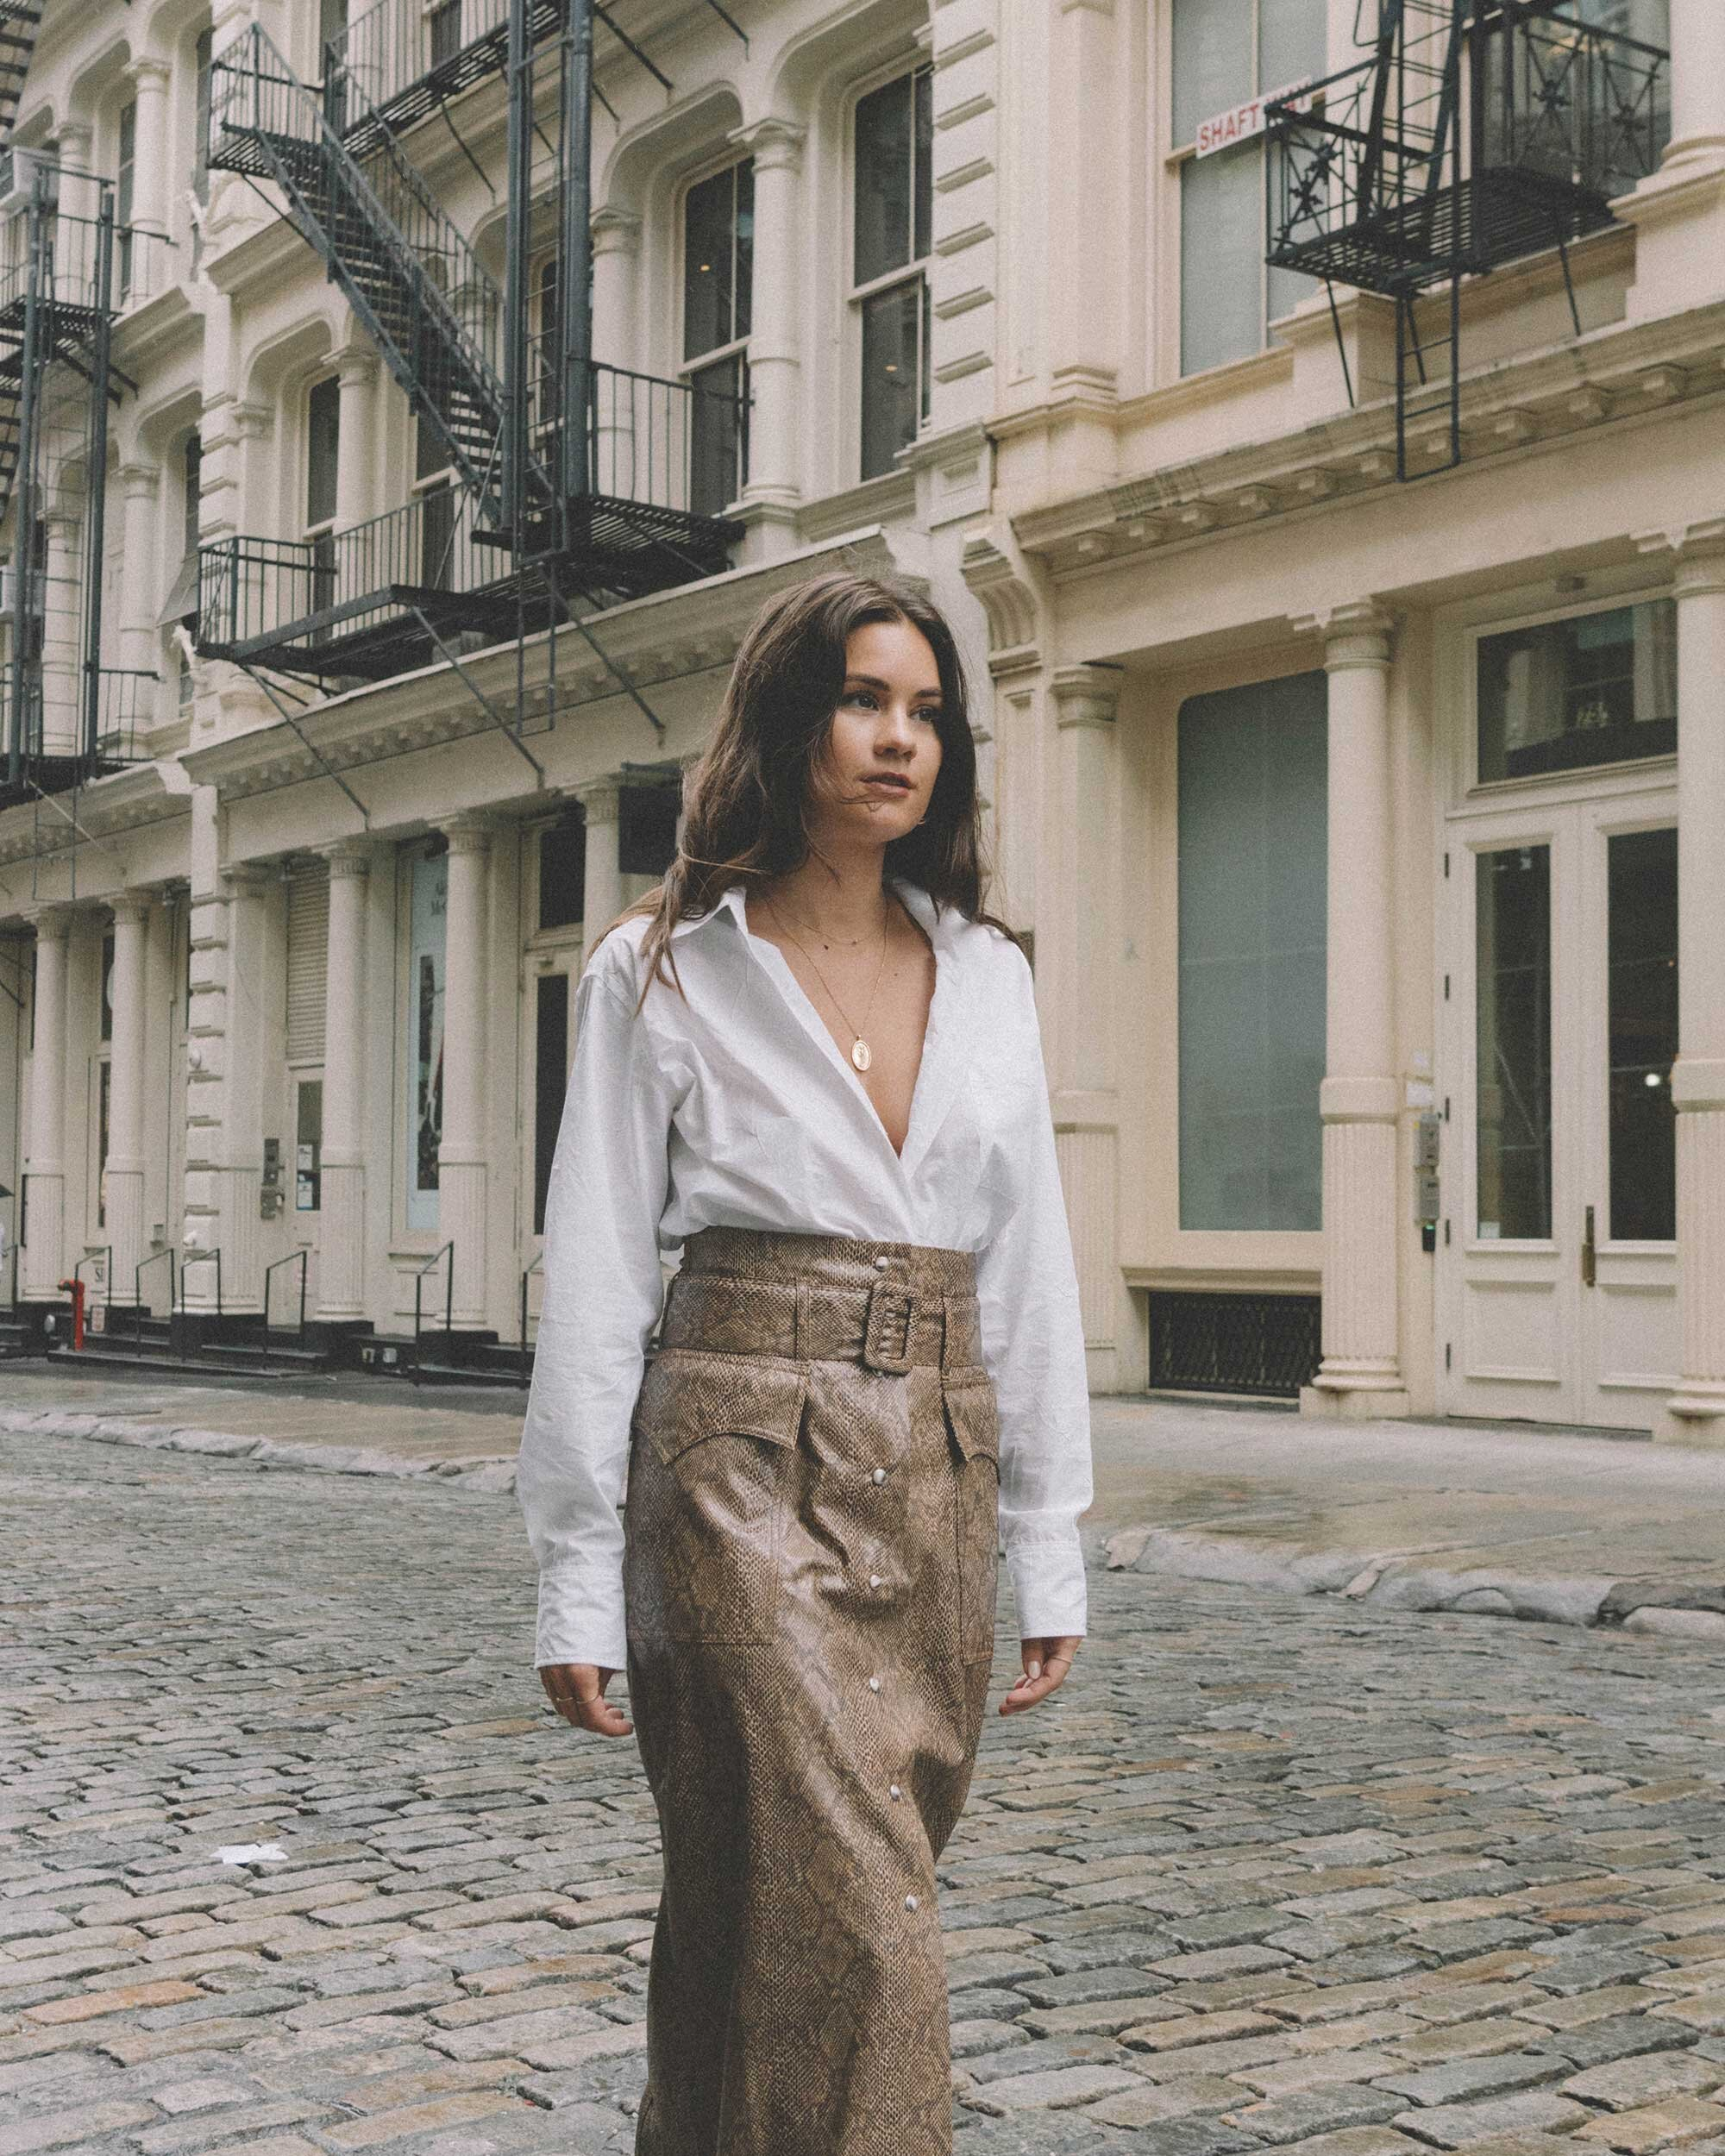 Sarah-Butler-of-Sarah-Styles-Seattle-wears-NANUSHKA-Aarohi-Python-Print-Vegan-Leather-Midi-Skirt-_-@sarahchristine--2.jpg